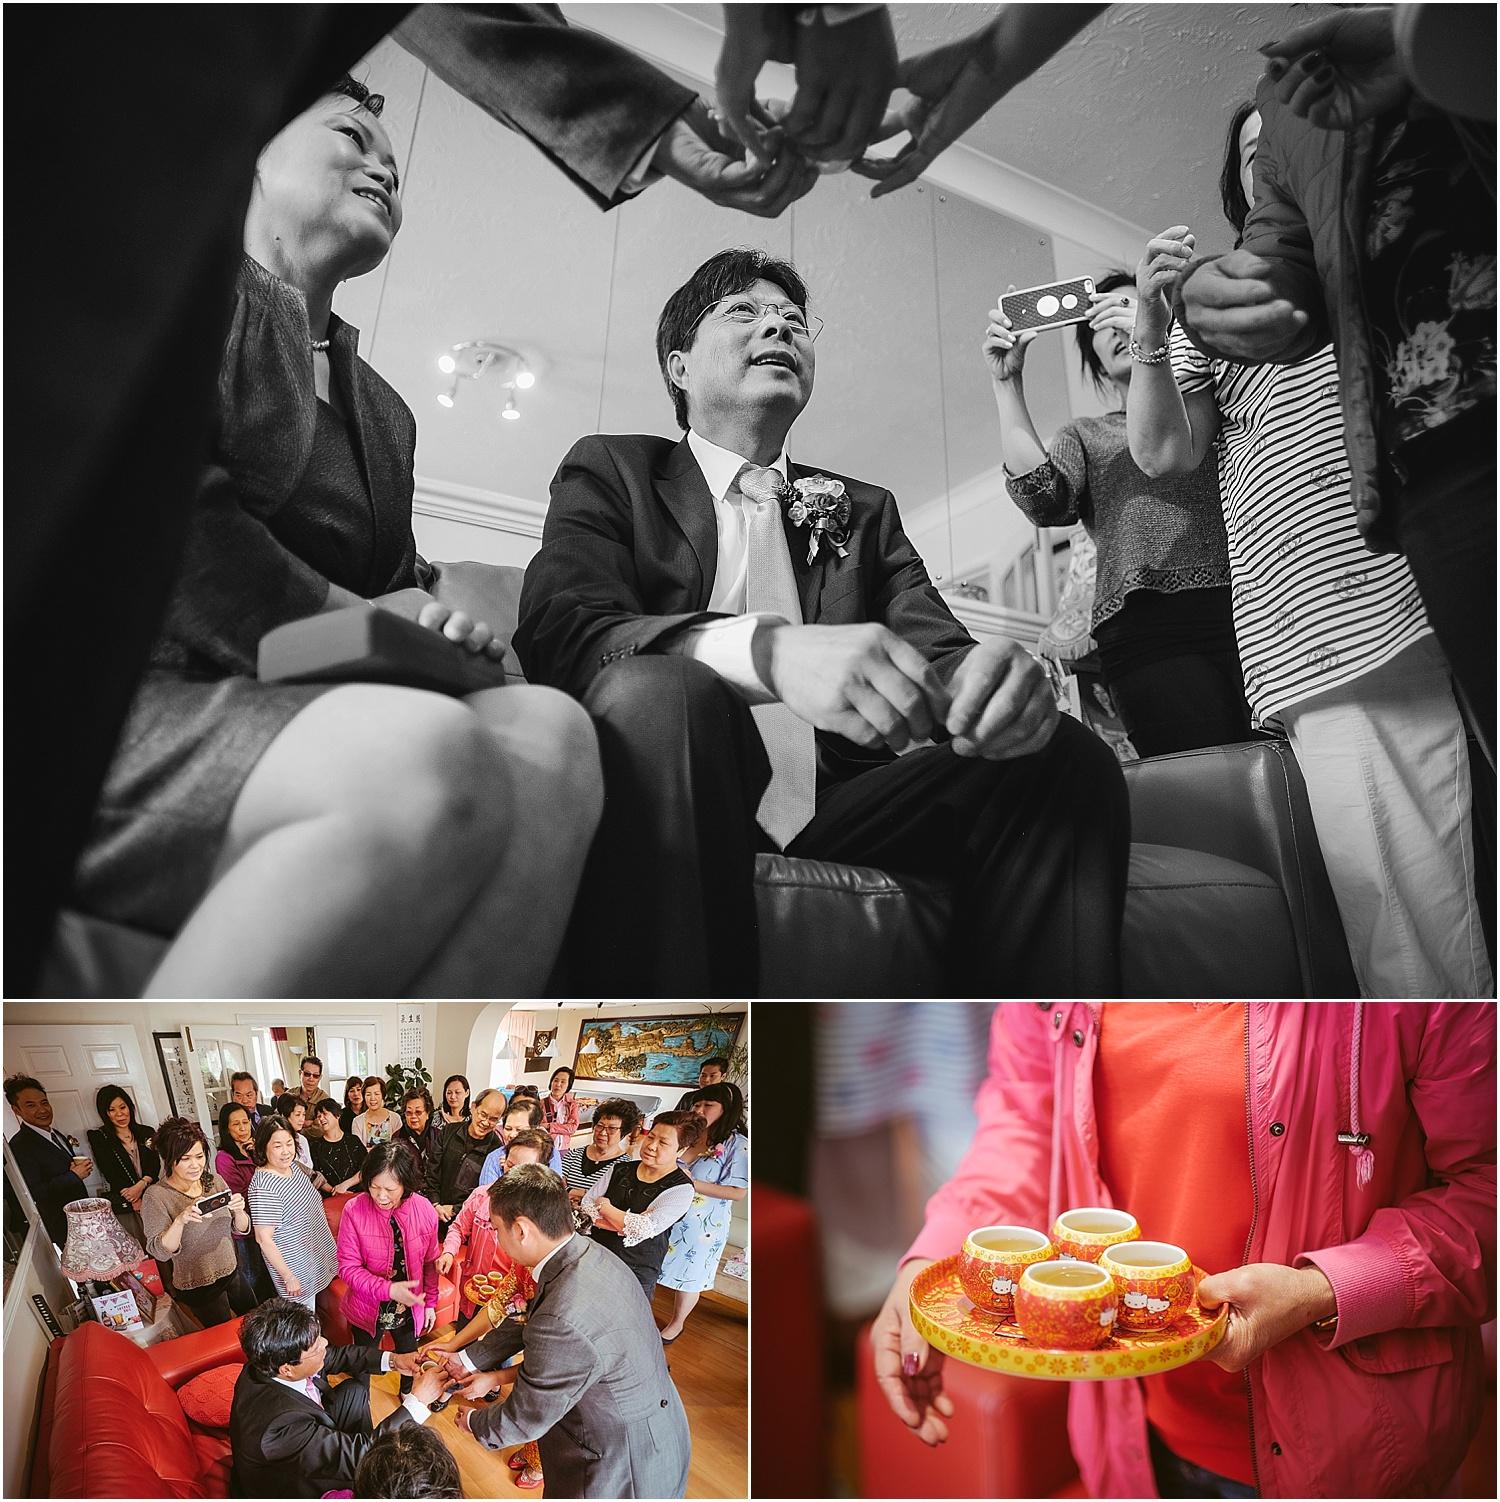 Matfen Hall wedding photography photography by www.2tonephotography.co.uk 019.jpg